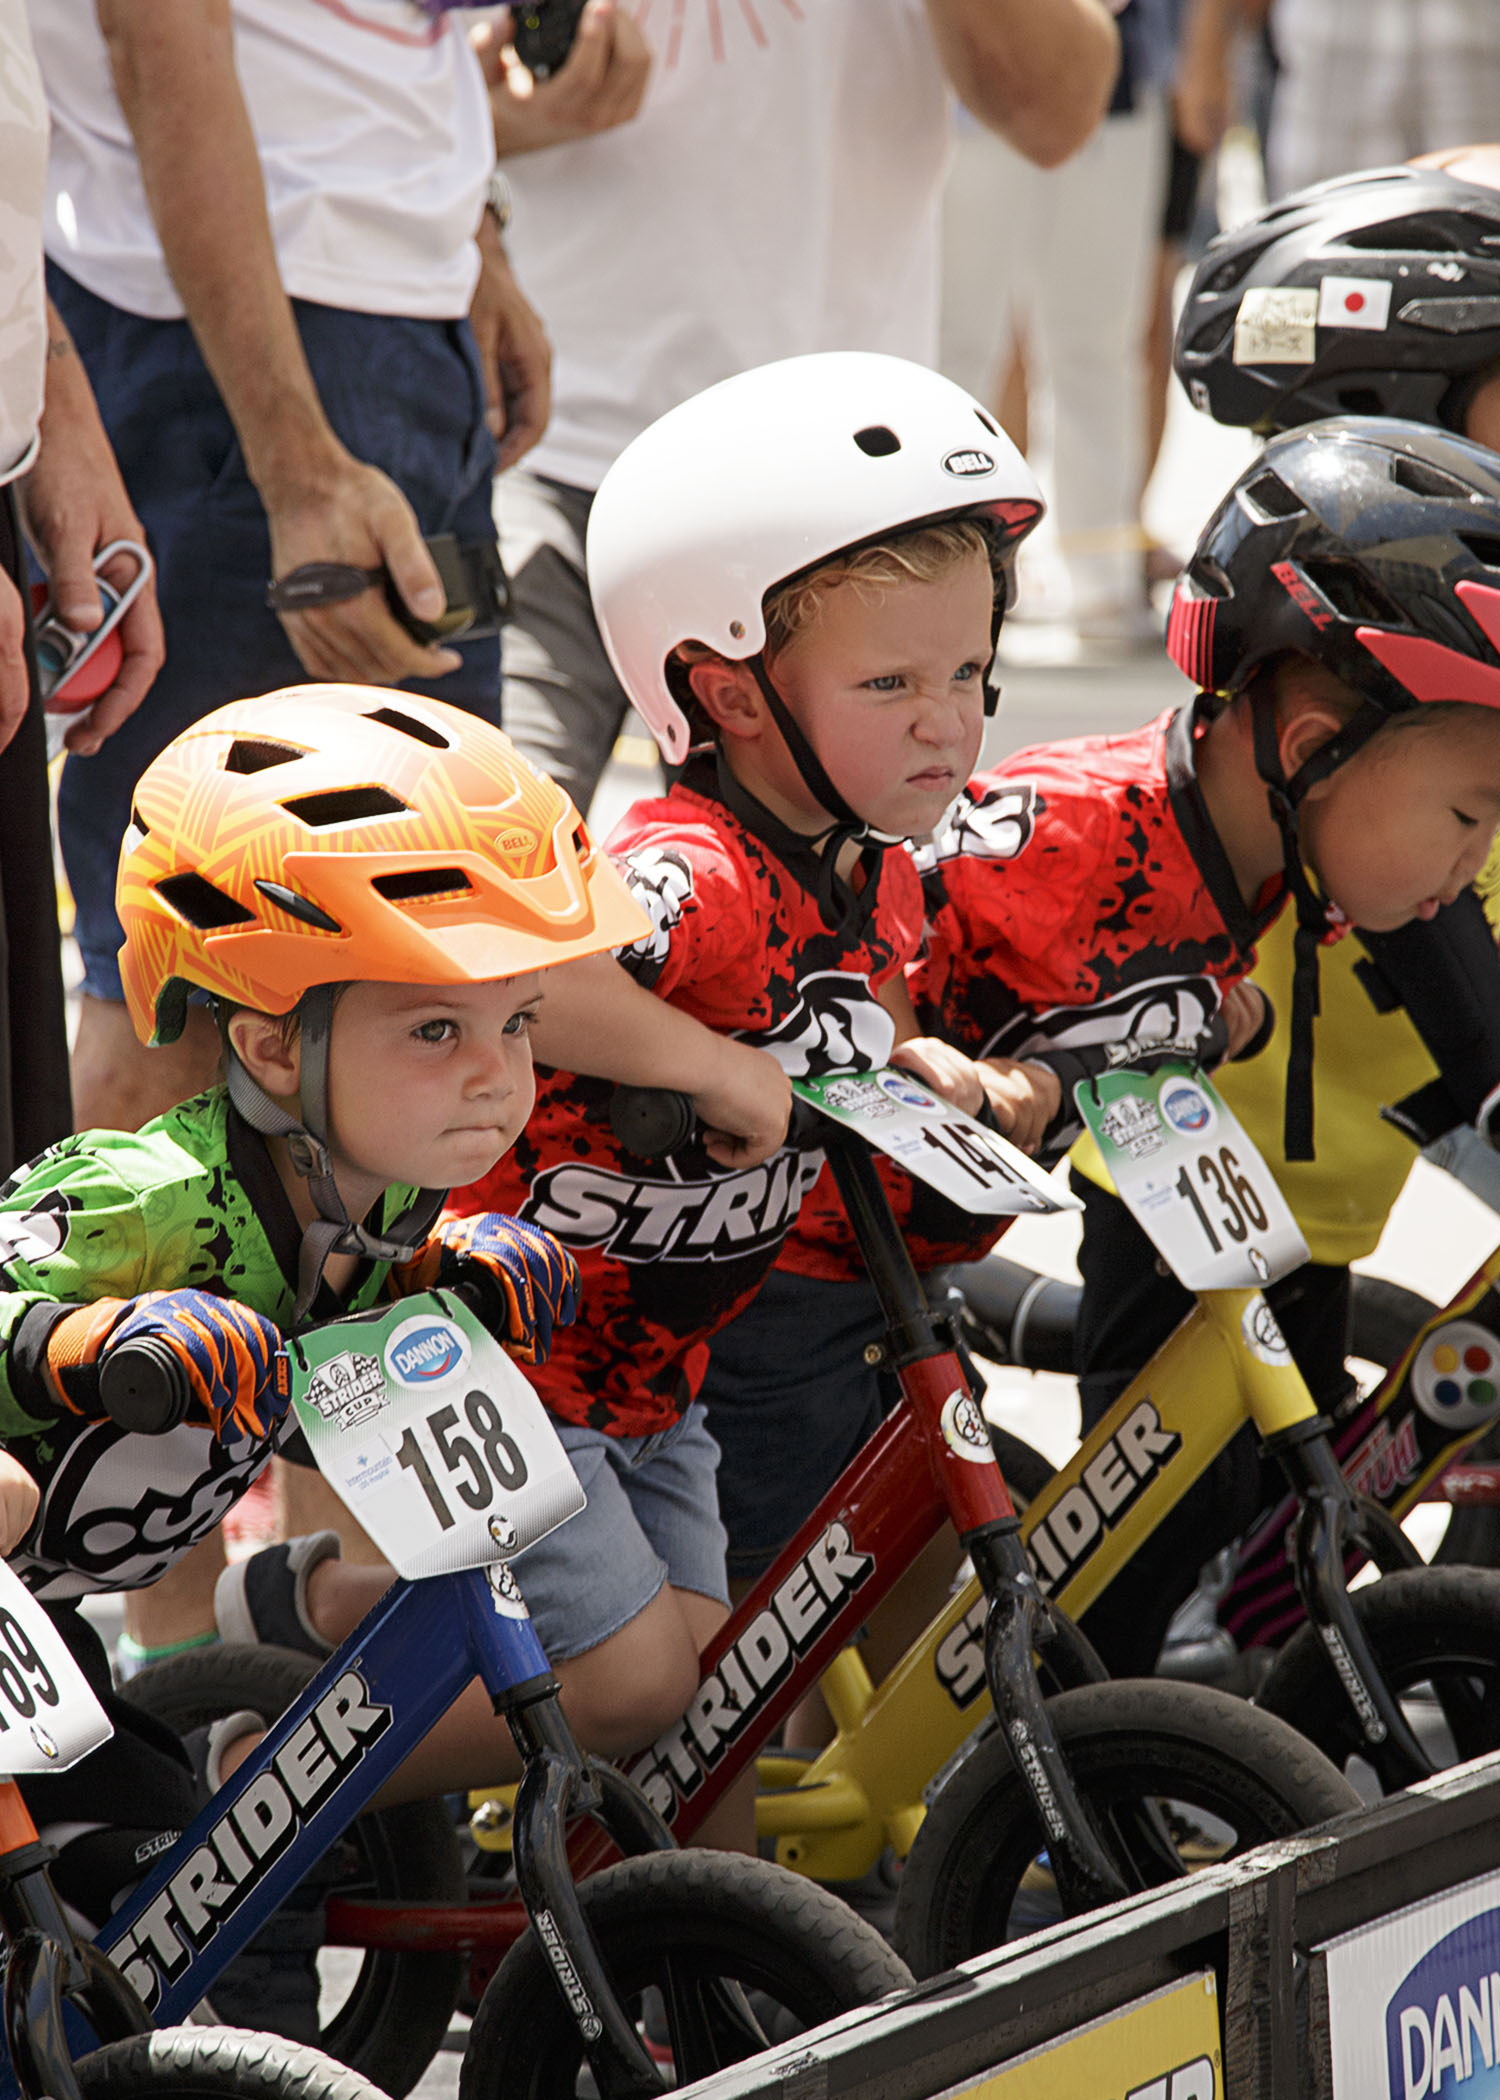 Boston's Strider bike race